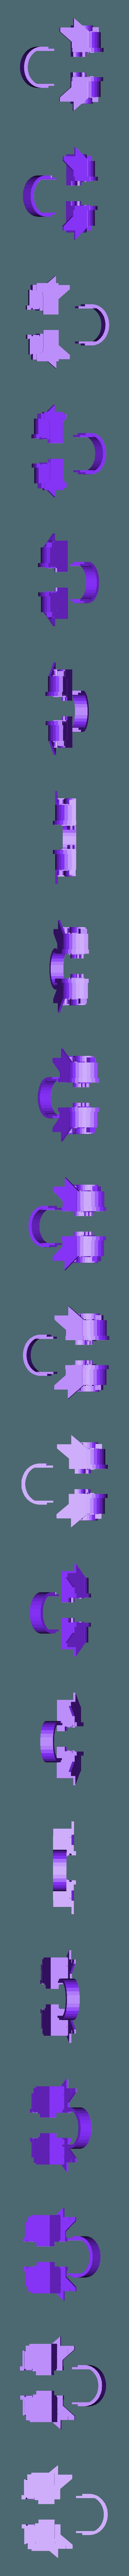 mk_d-4lt_pc_drivepack.stl Download free STL file Big Plasma Cannon Turret • 3D printing design, JtStrait72